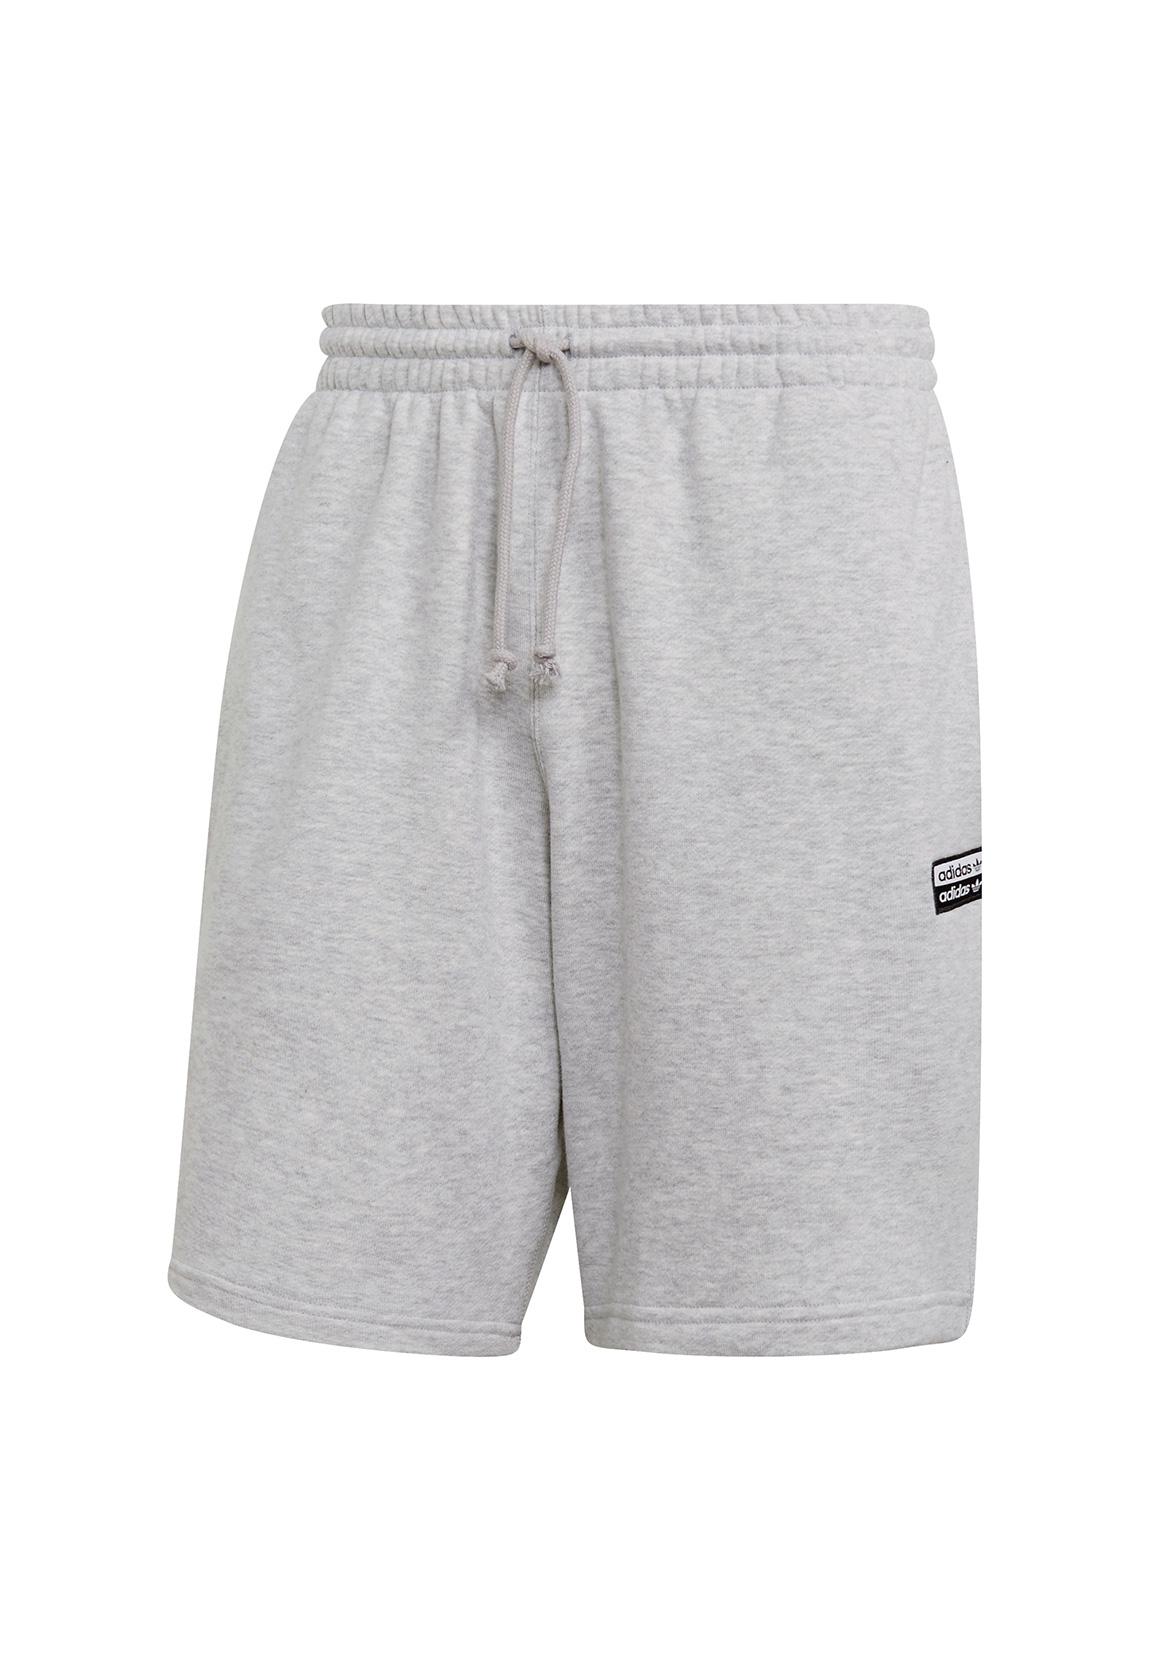 4eecd51bc1c716 Adidas Originals Shorts Herren VOCAL SHORT ED7234 Grau Herren ...